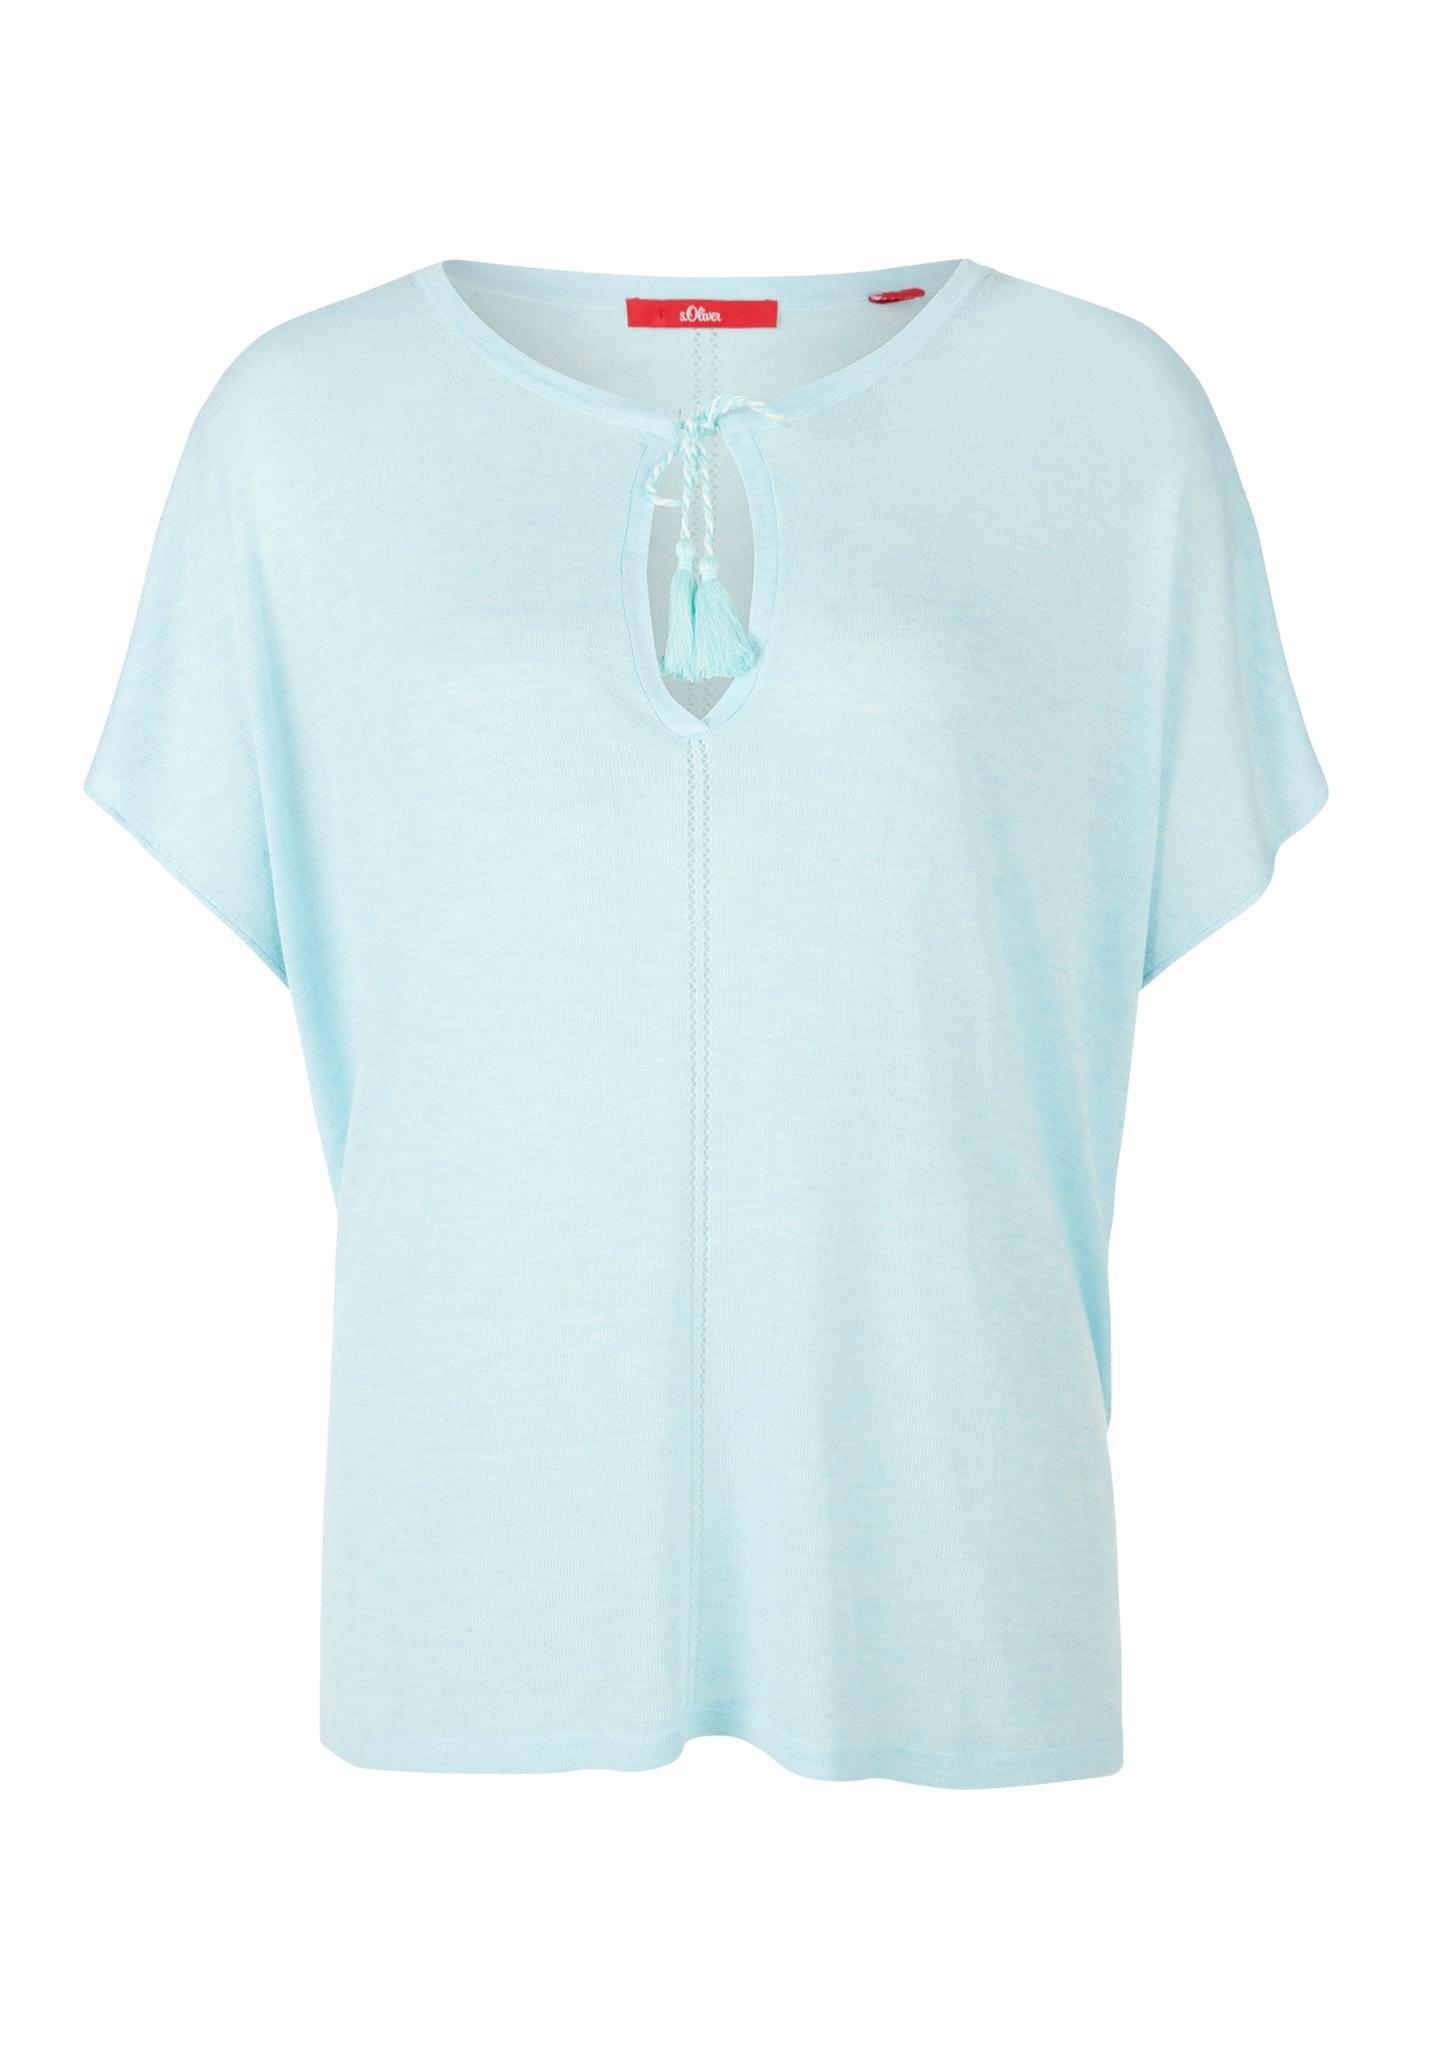 Kurzarmpullover | Bekleidung > Pullover > Kurzarmpullover | s.Oliver